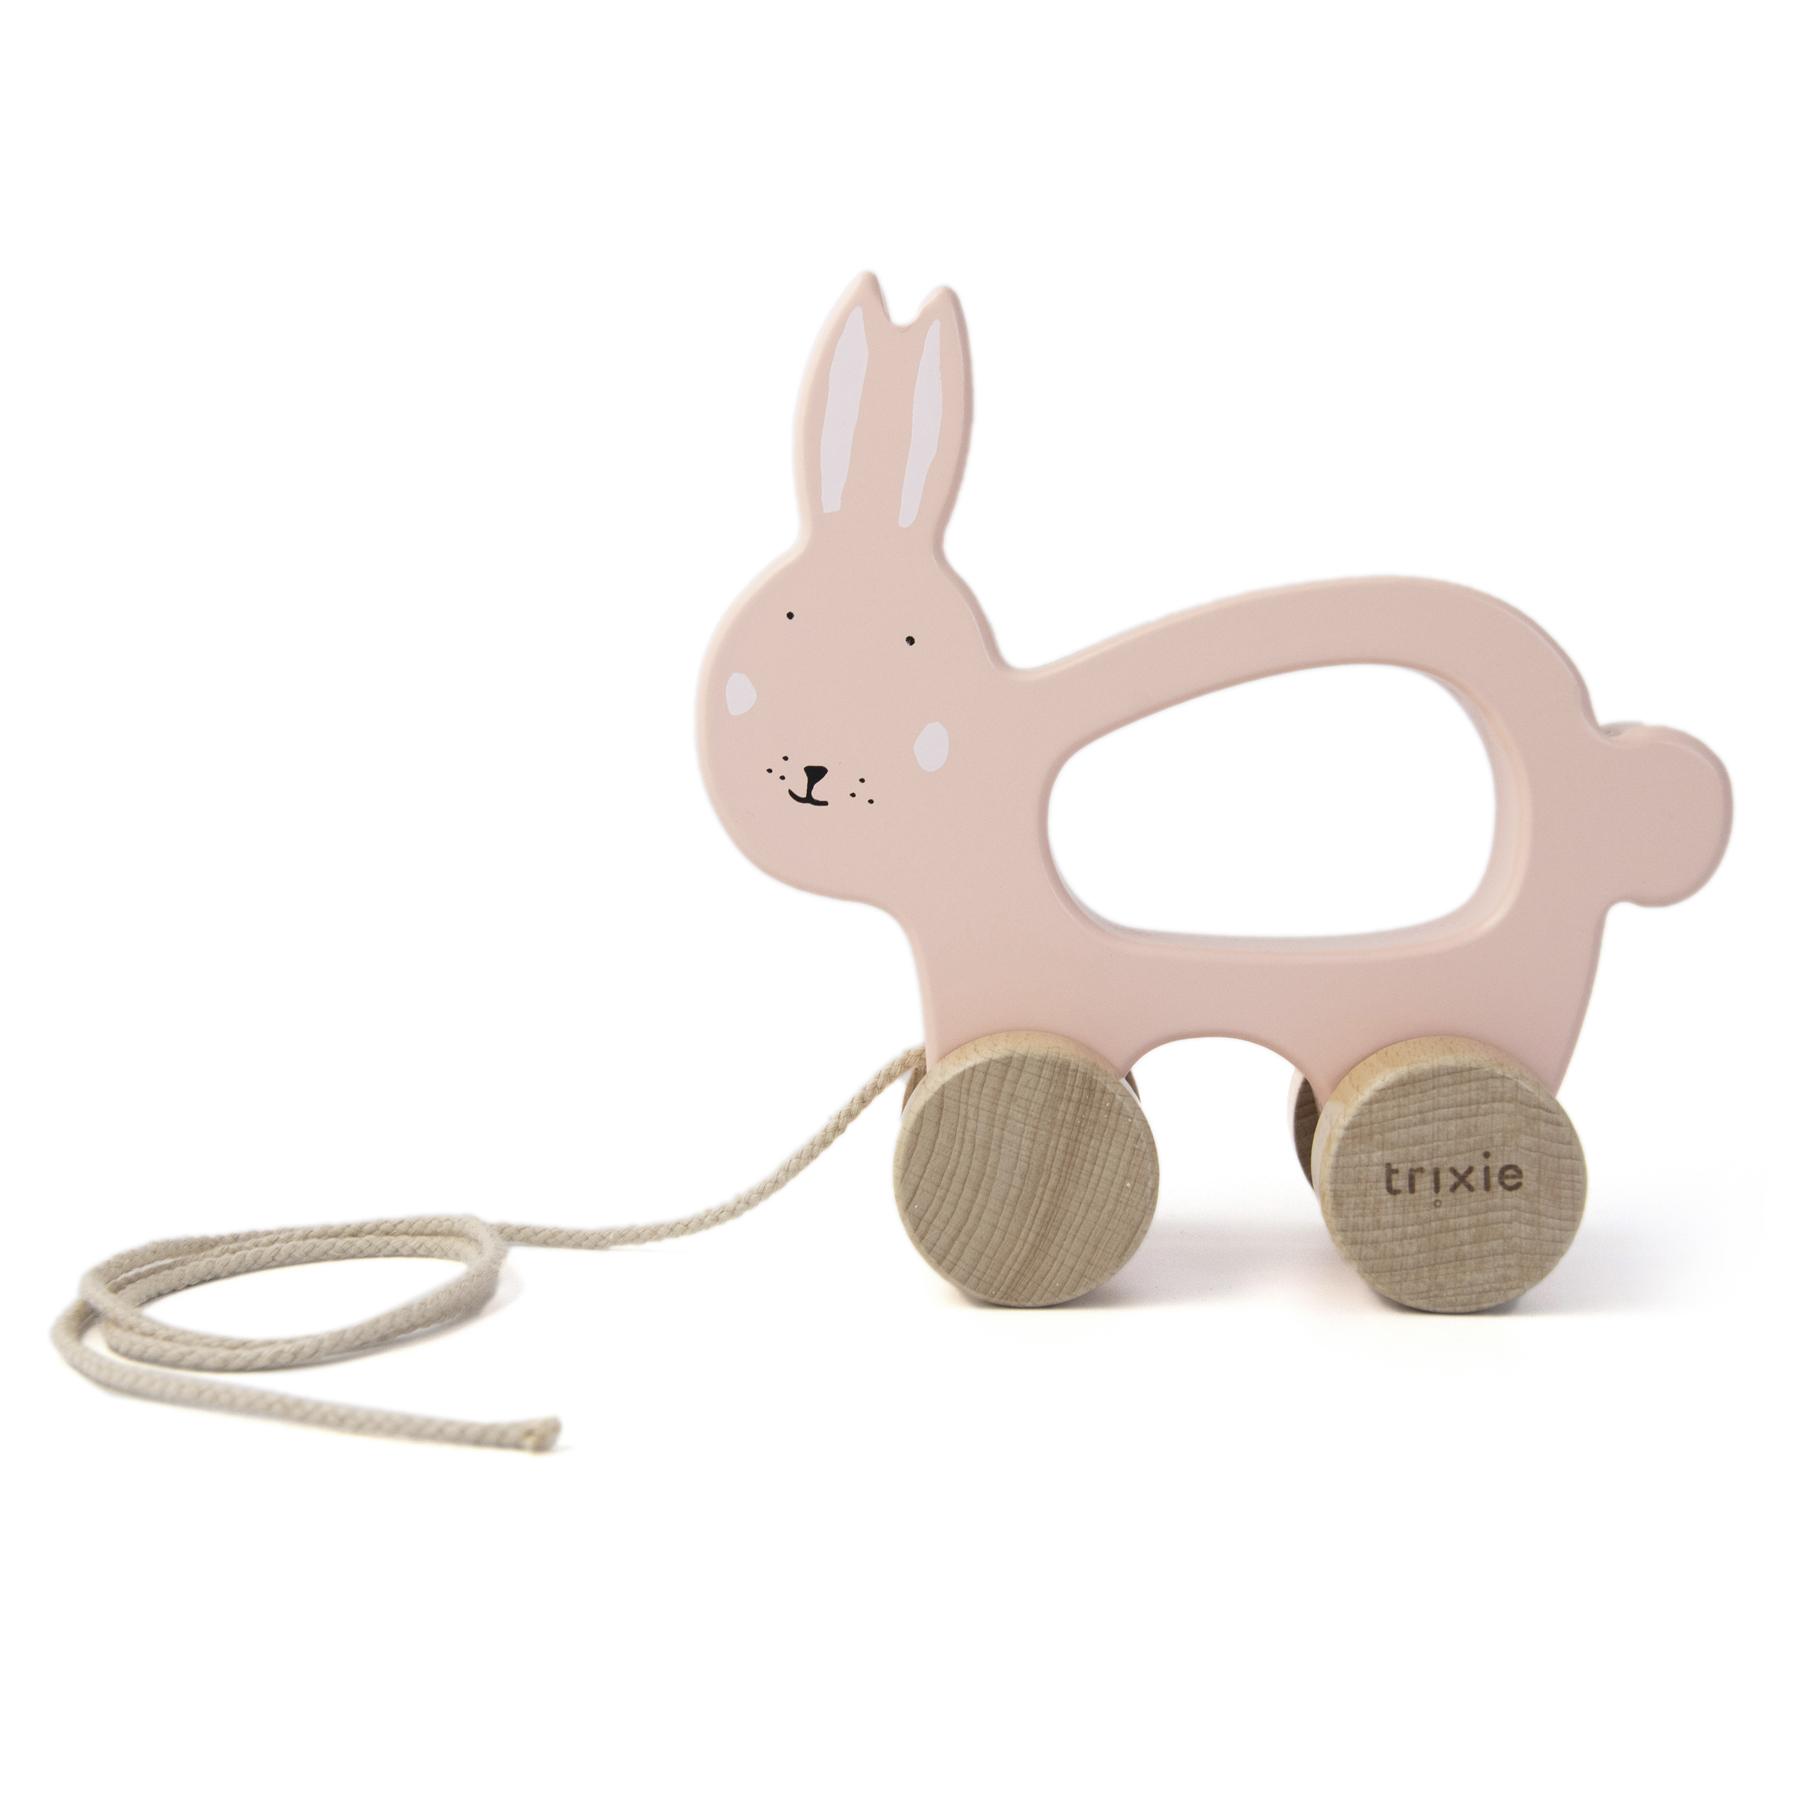 Afbeelding Trixie Houten trekspeeltje I Mrs Rabbit